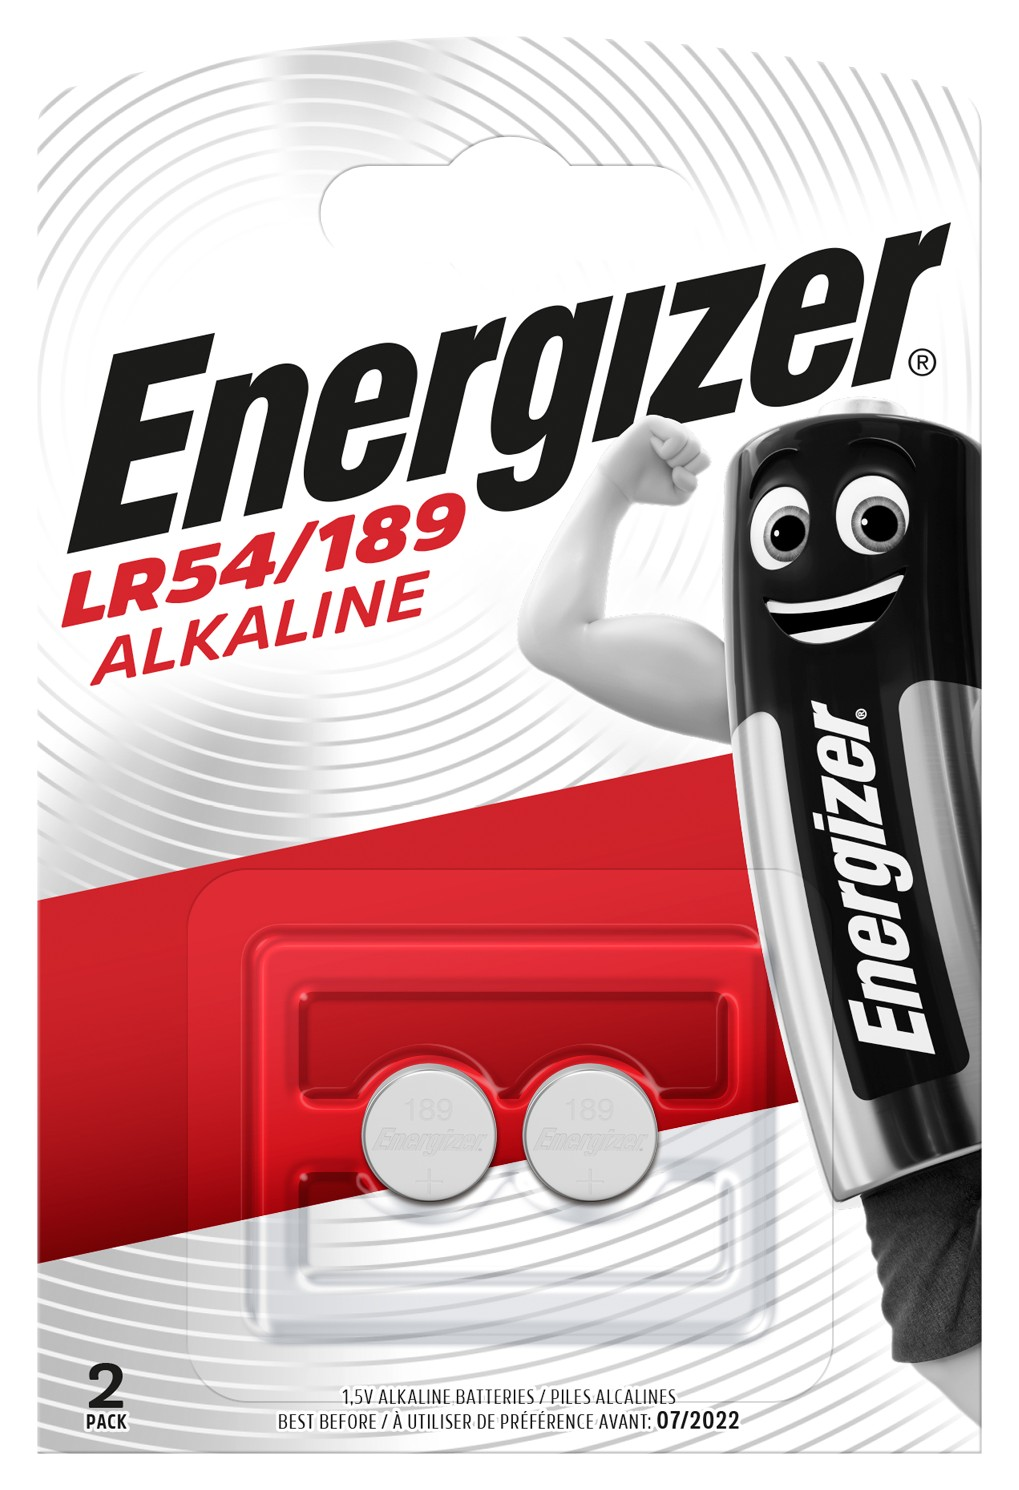 Baterie LR54/189 ENERGIZER, 2 ks (blistr)